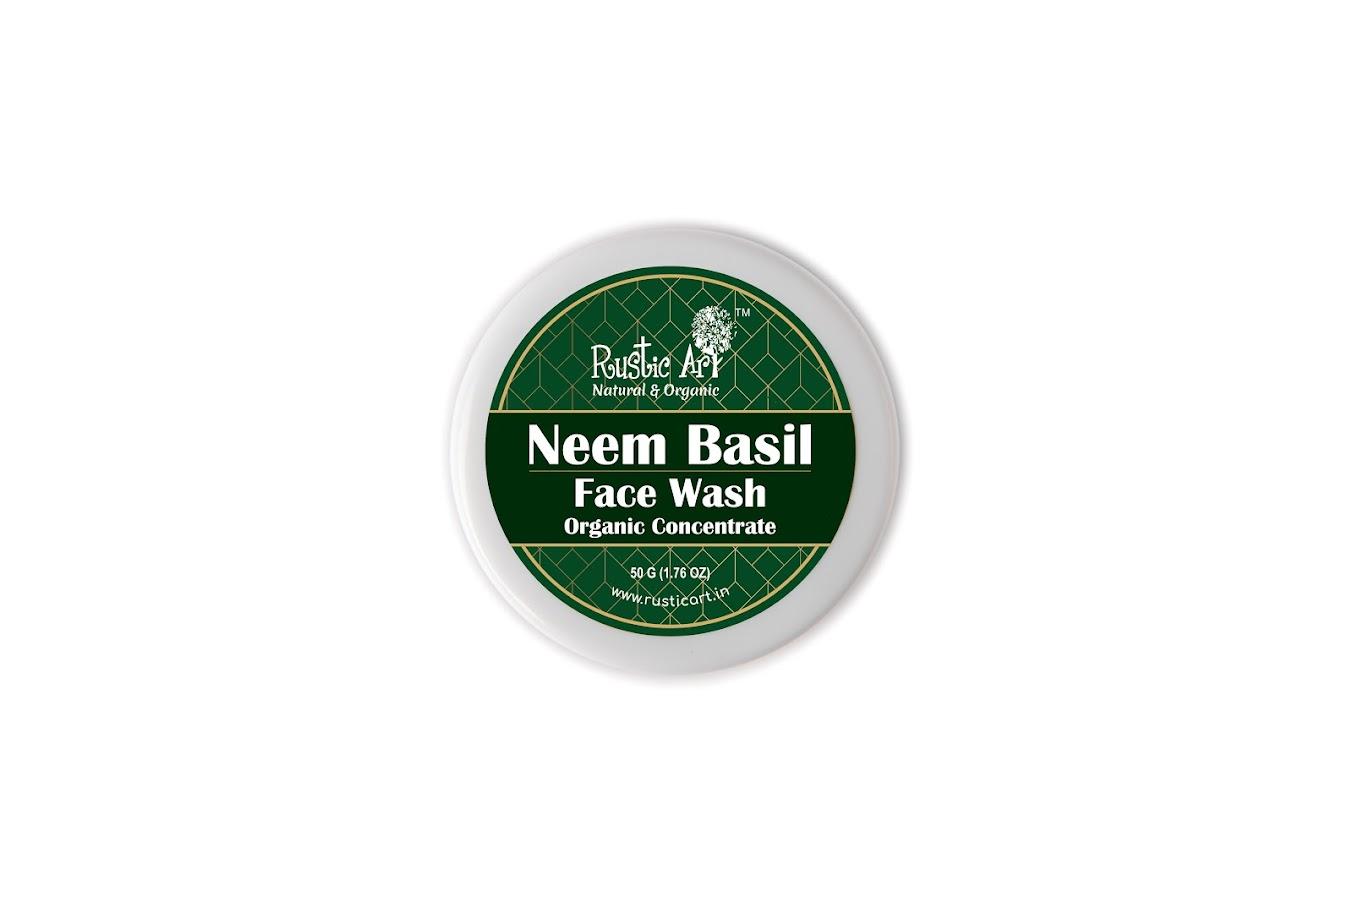 Rustic Art Organic Neem Basil Face Wash Concentrate